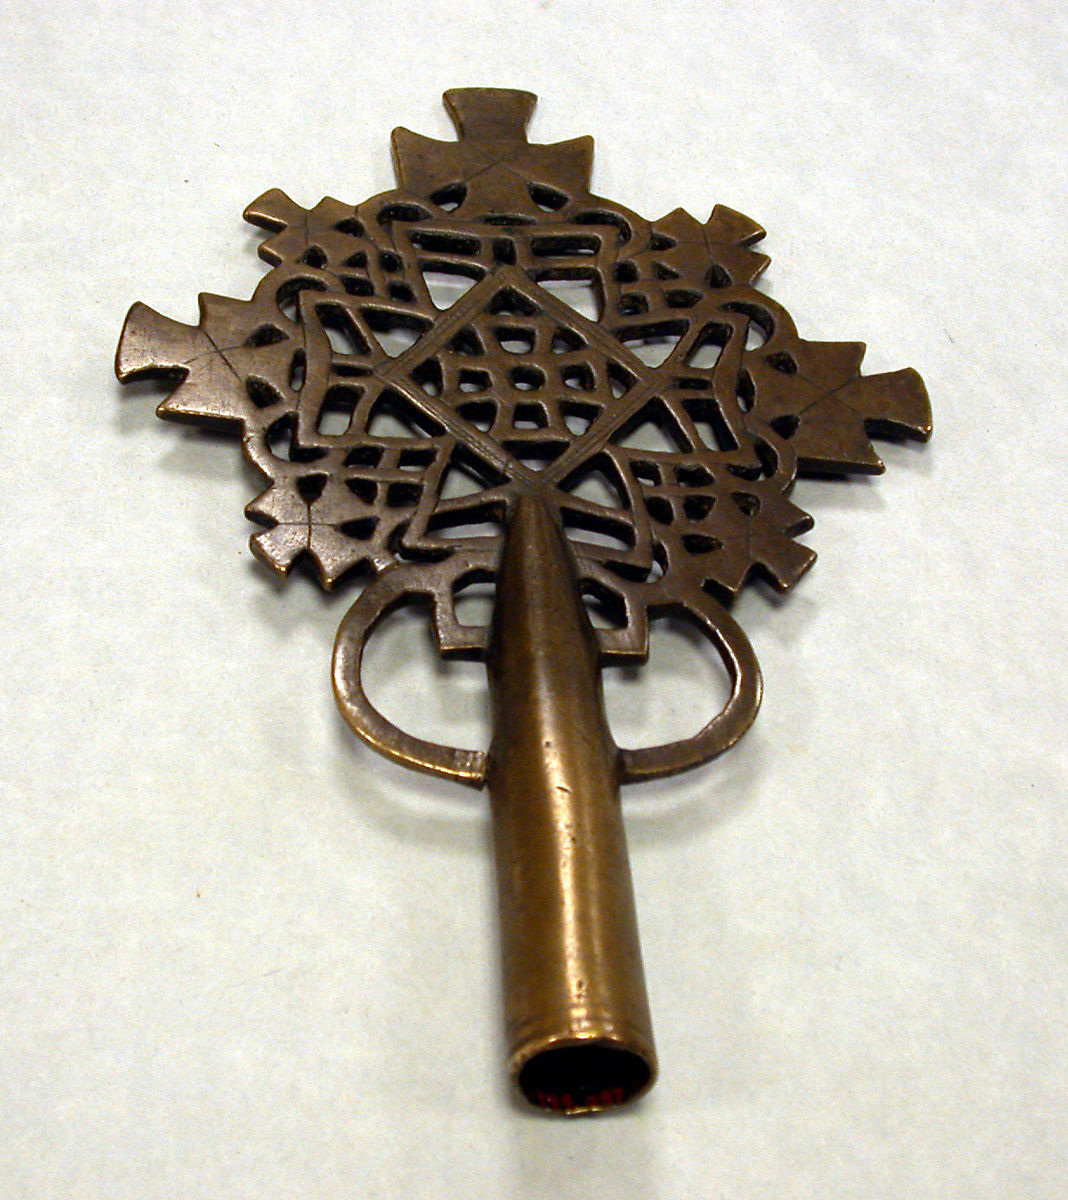 Processional Cross (qäqwami mäsqäl) | Amhara or Tigrinya peoples | The Met